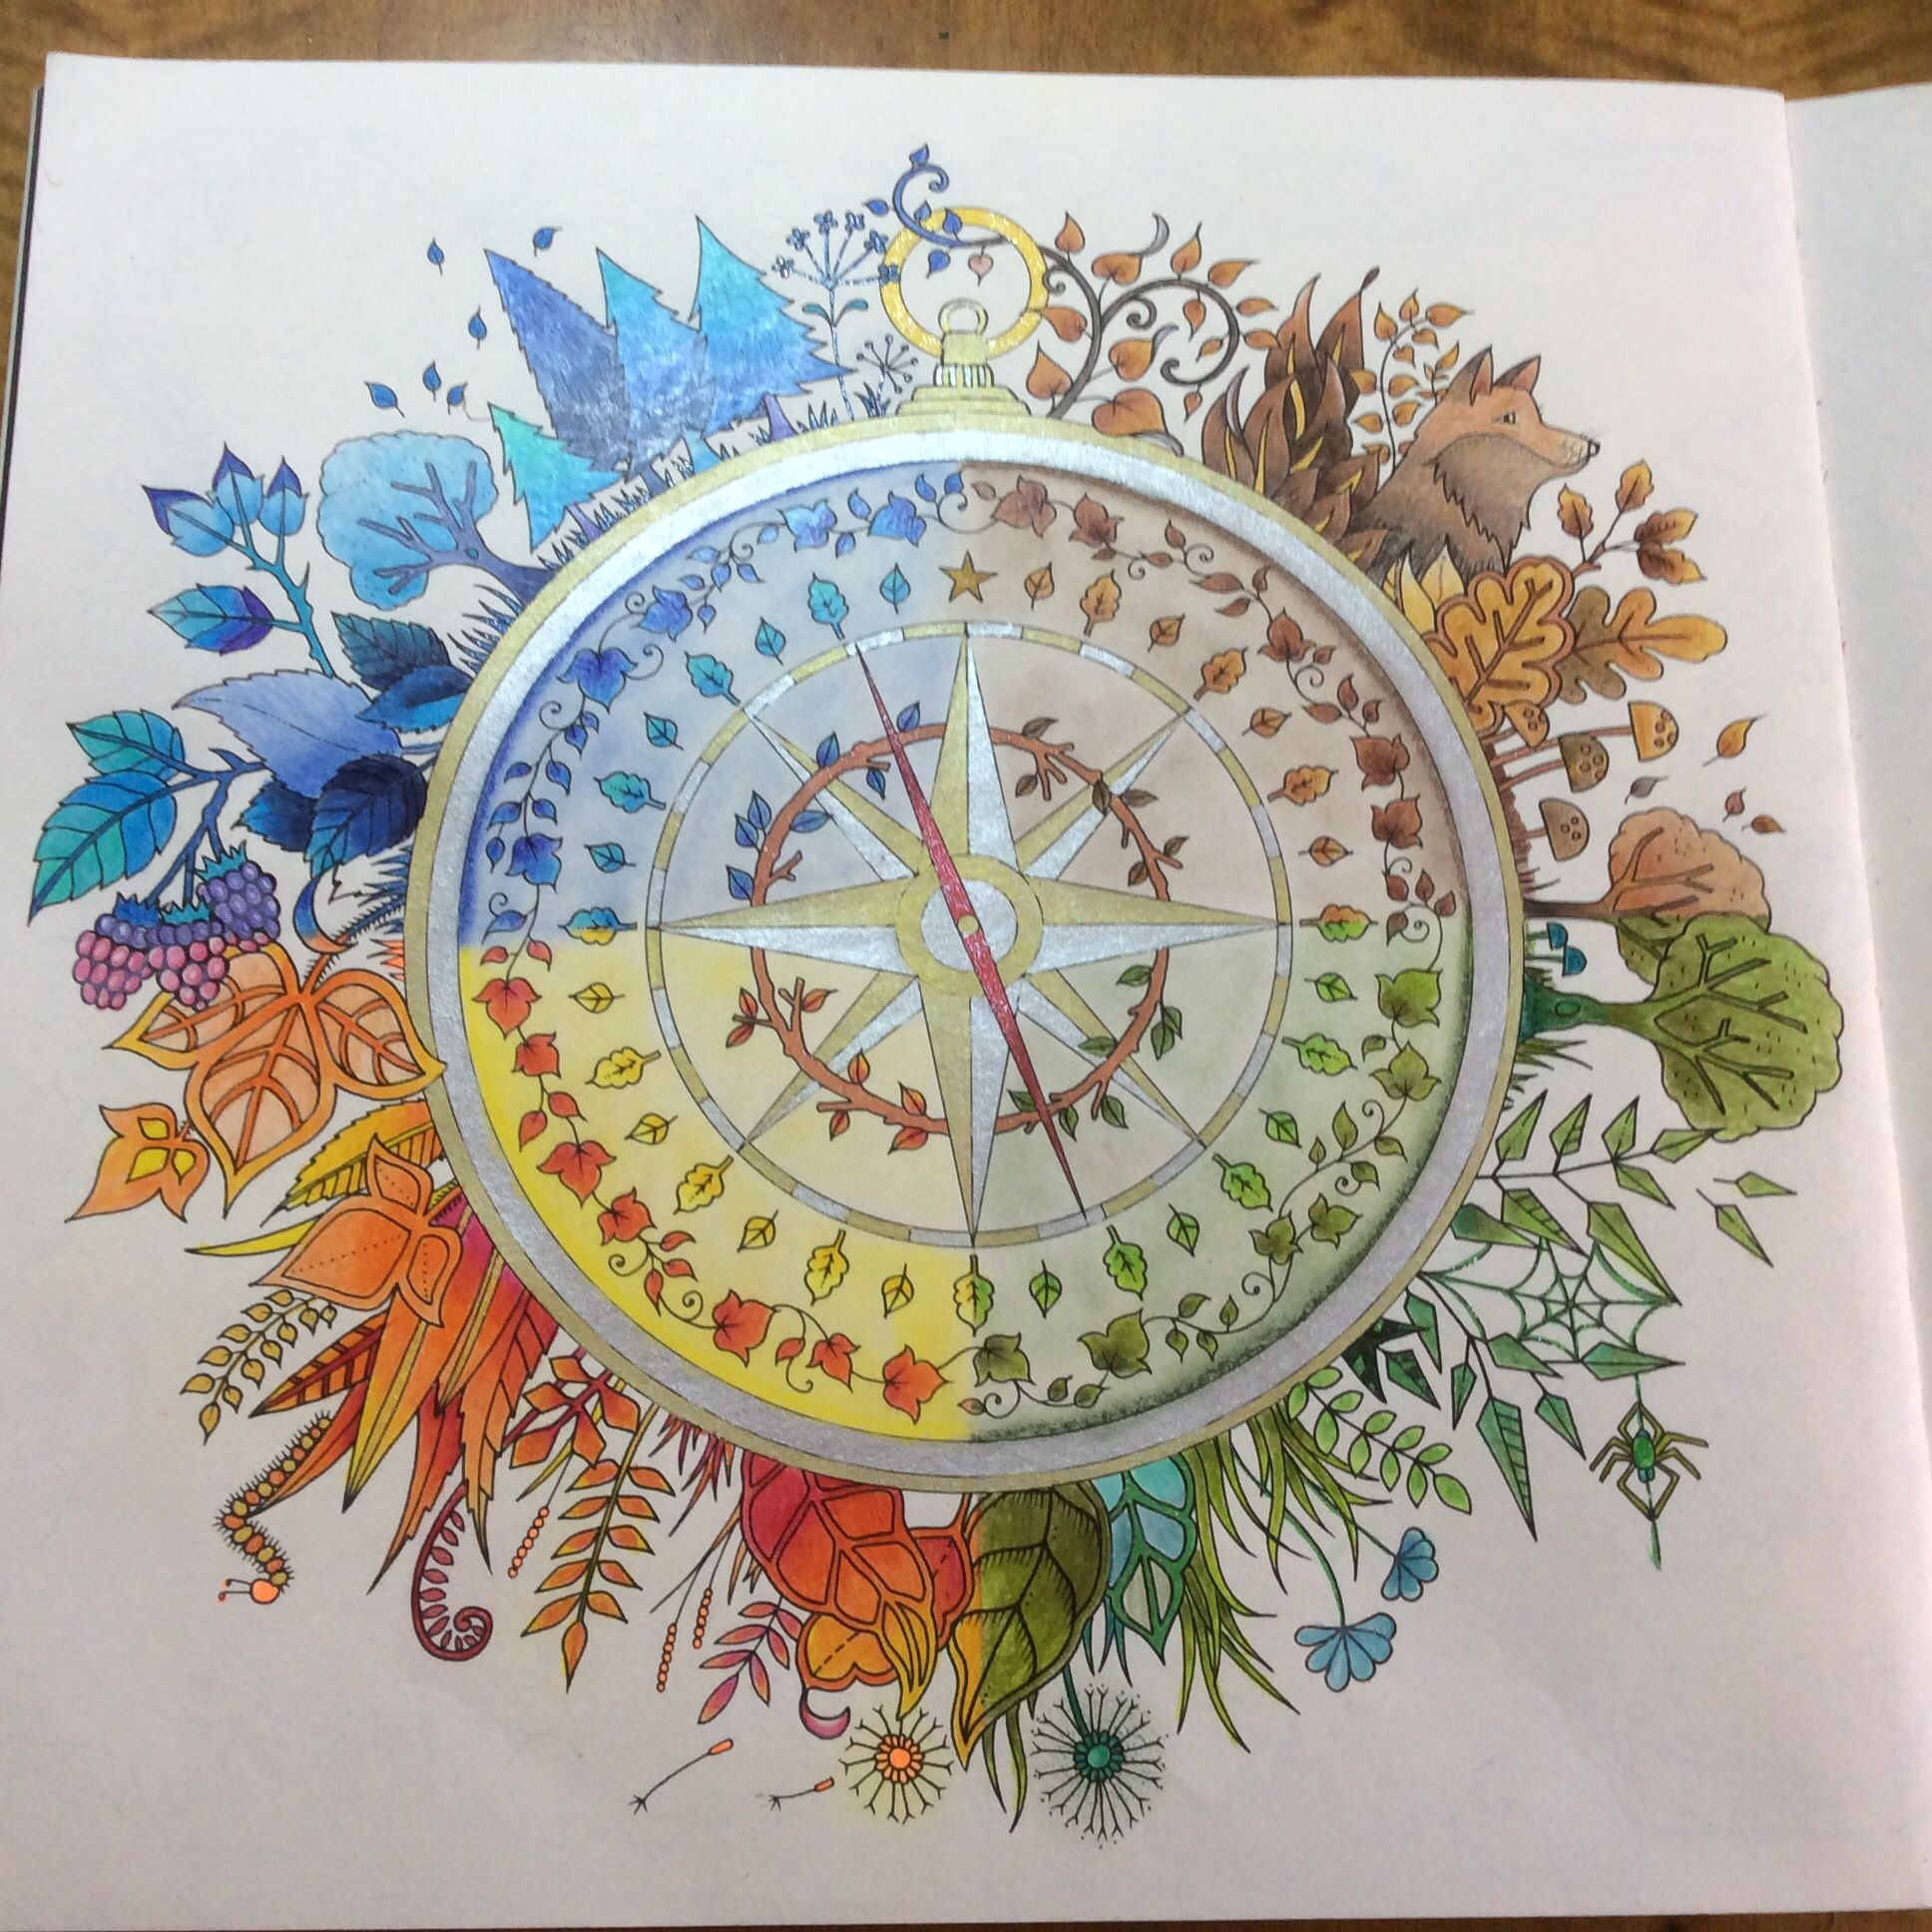 Joanna Basford Floresta Encantada Bssola Coloring BooksAdult ColoringColouringJohanna